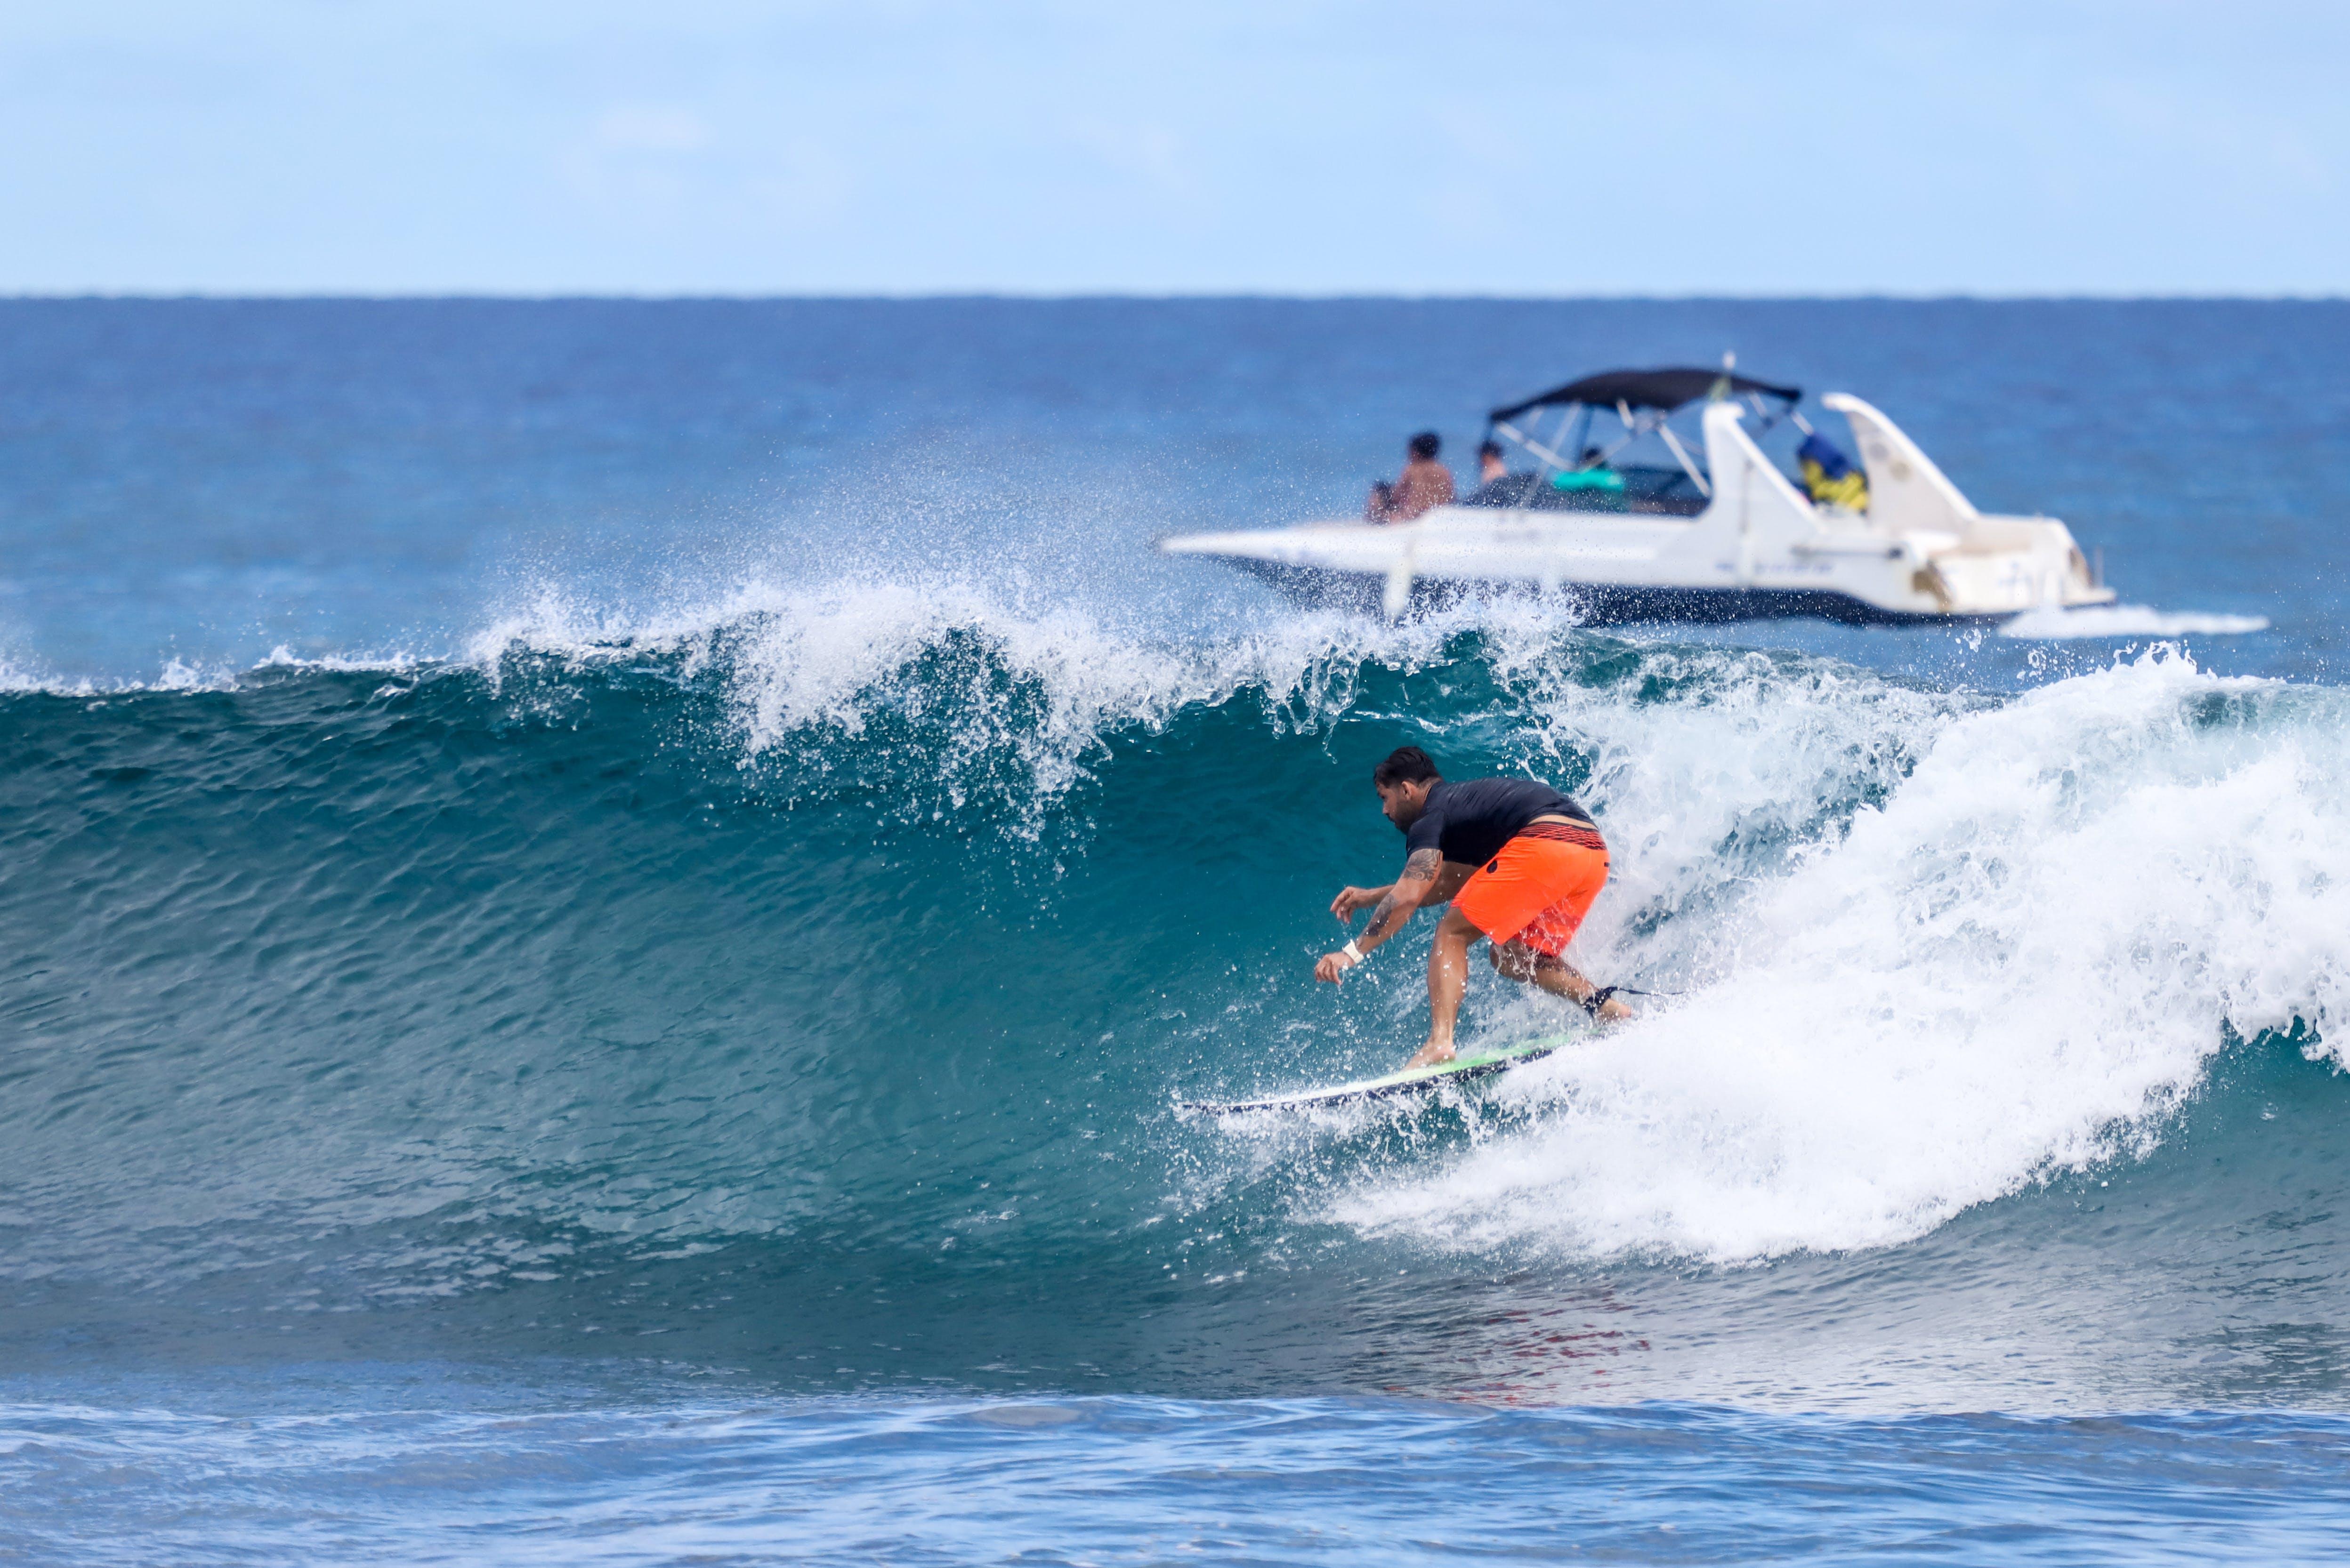 Man Surfboarding